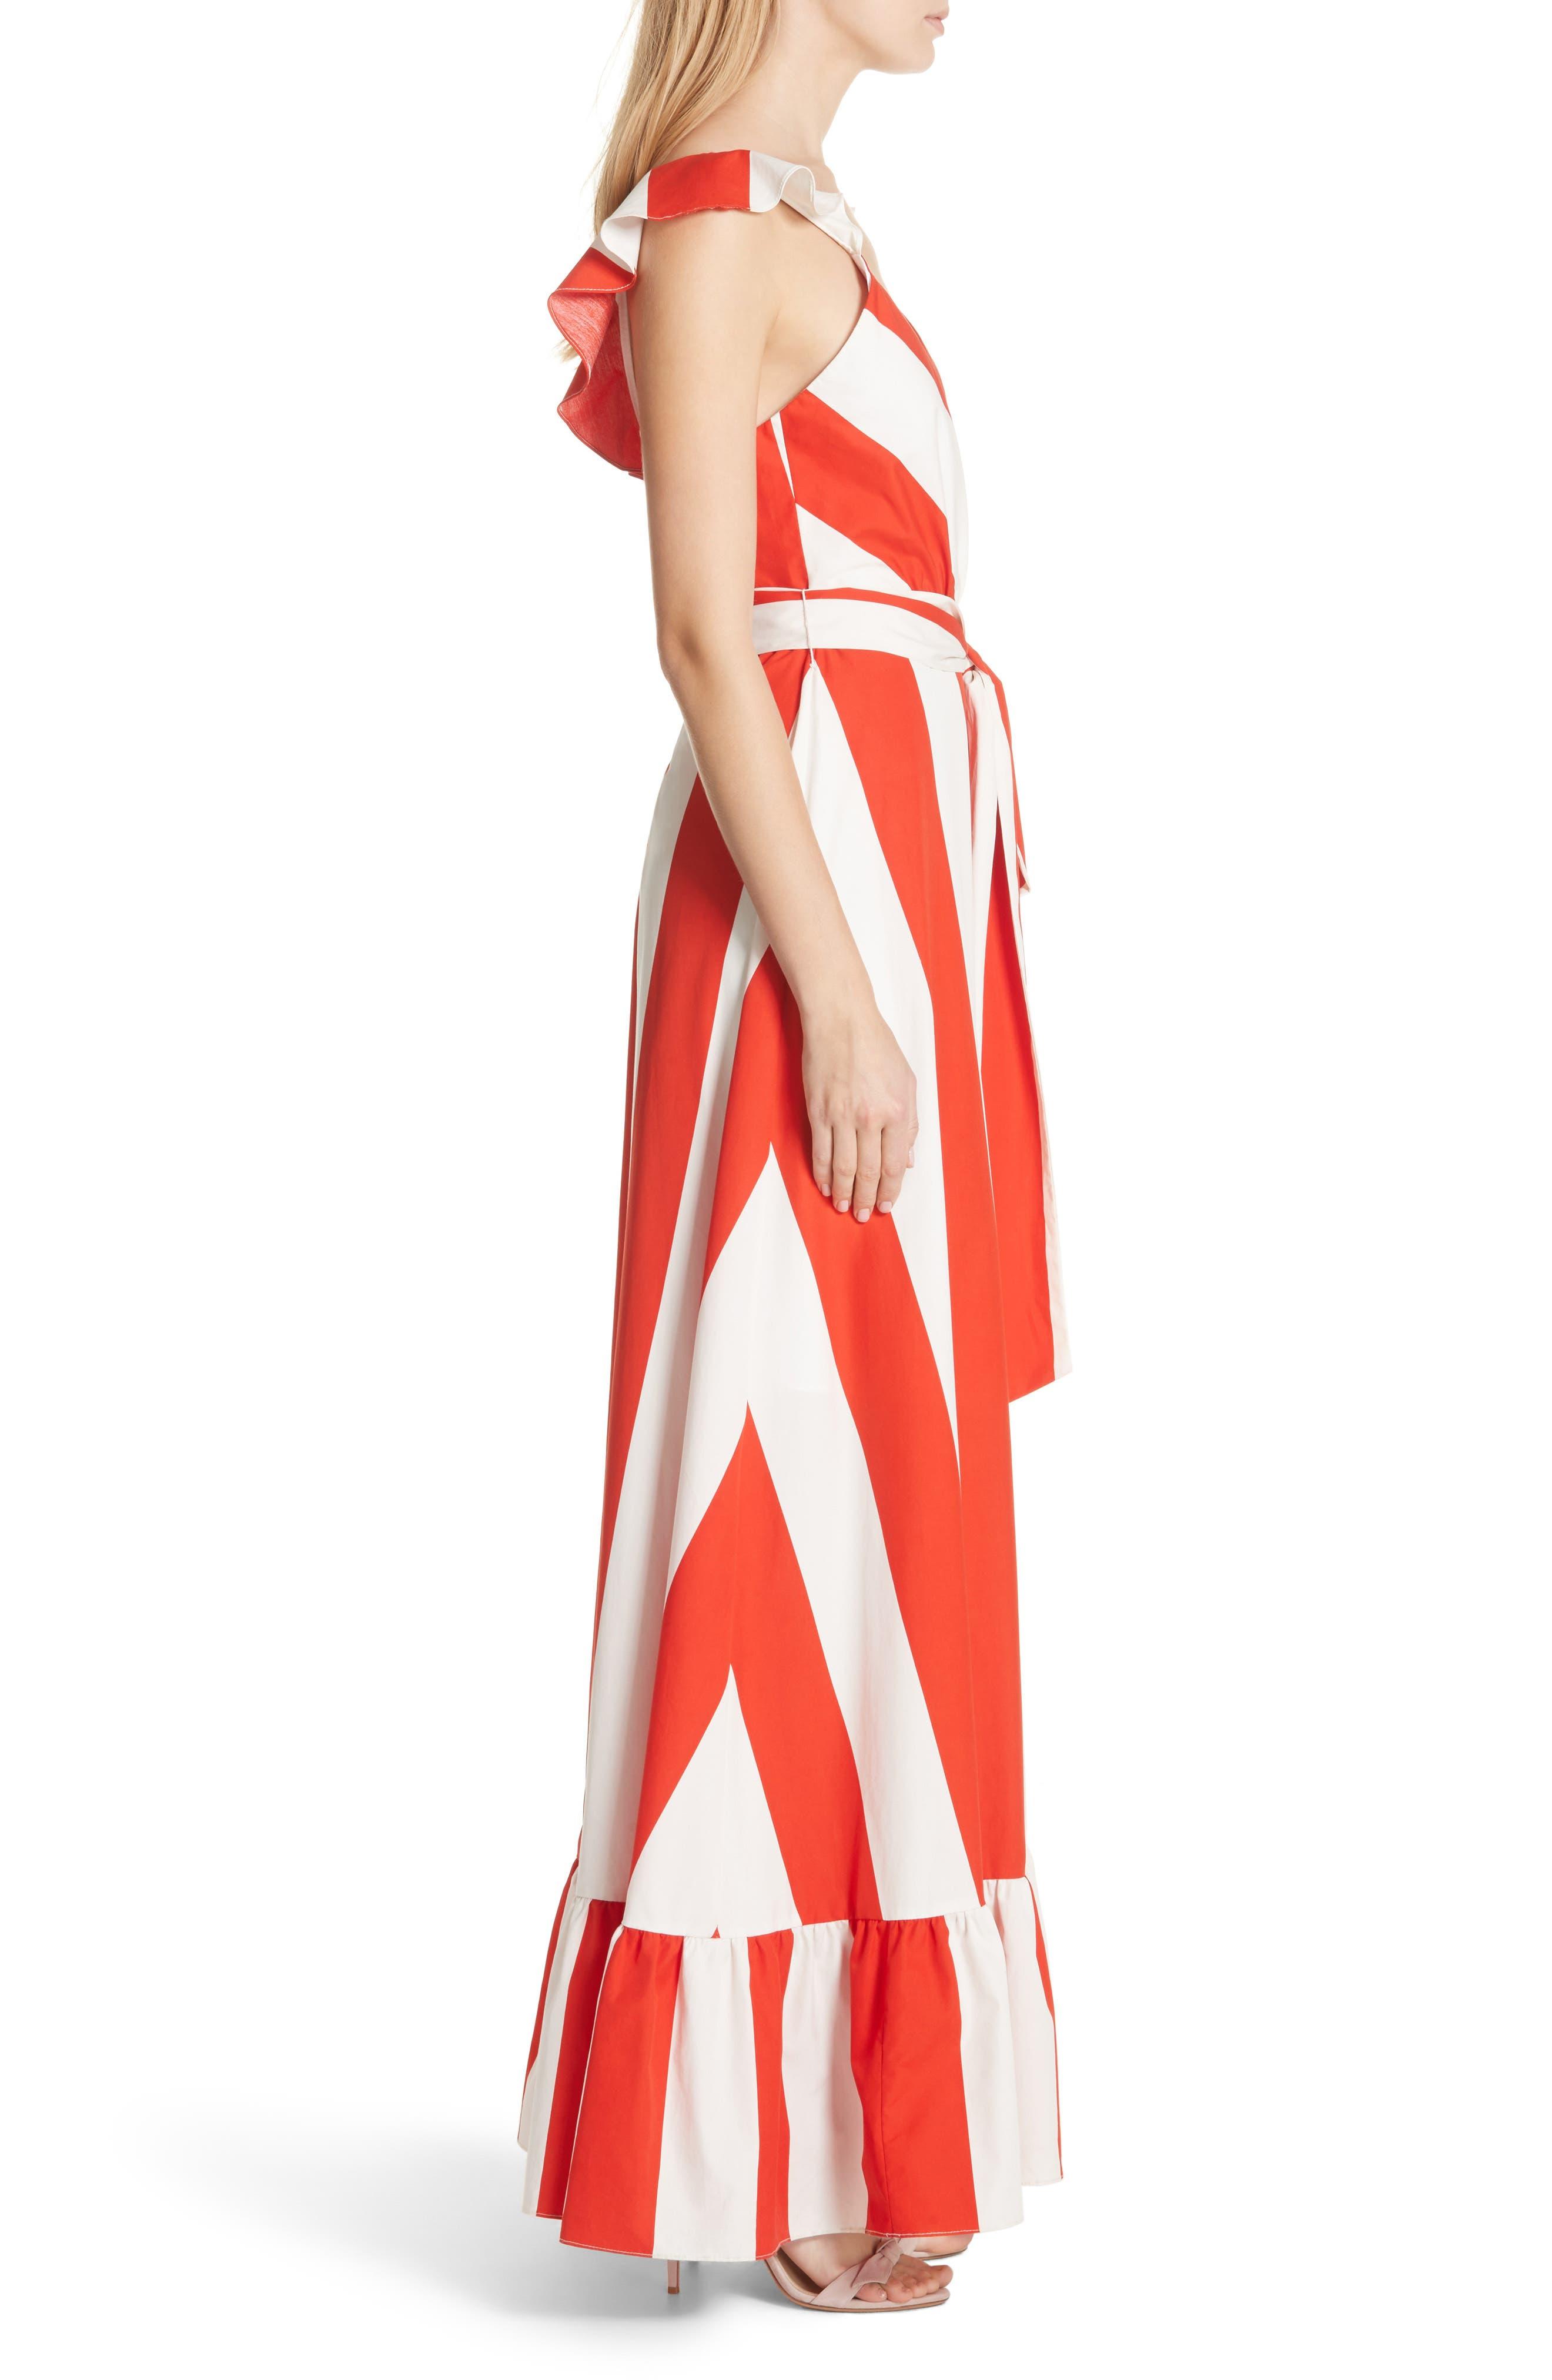 Fernanda Stripe Cotton Maxi Dress,                             Alternate thumbnail 3, color,                             601